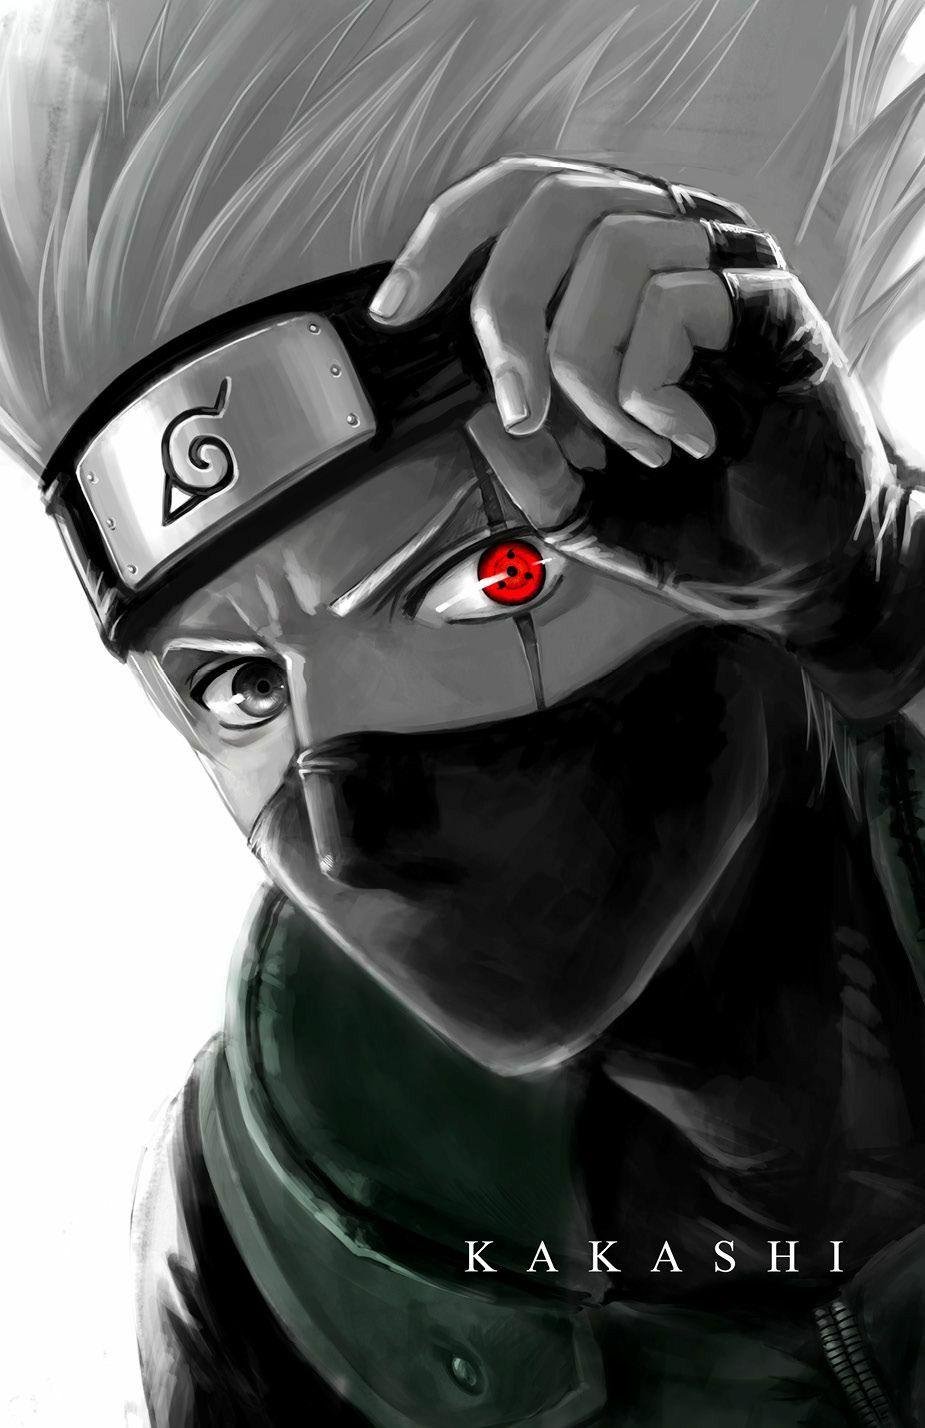 Iphone X Xr Xs 6 7 8 Plus Art Printed Phone Case Copy Ninja Kakashi Kakashi Sharingan Wallpaper Naruto Shippuden Naruto Shippuden Sasuke Anime wallpaper iphone xr naruto